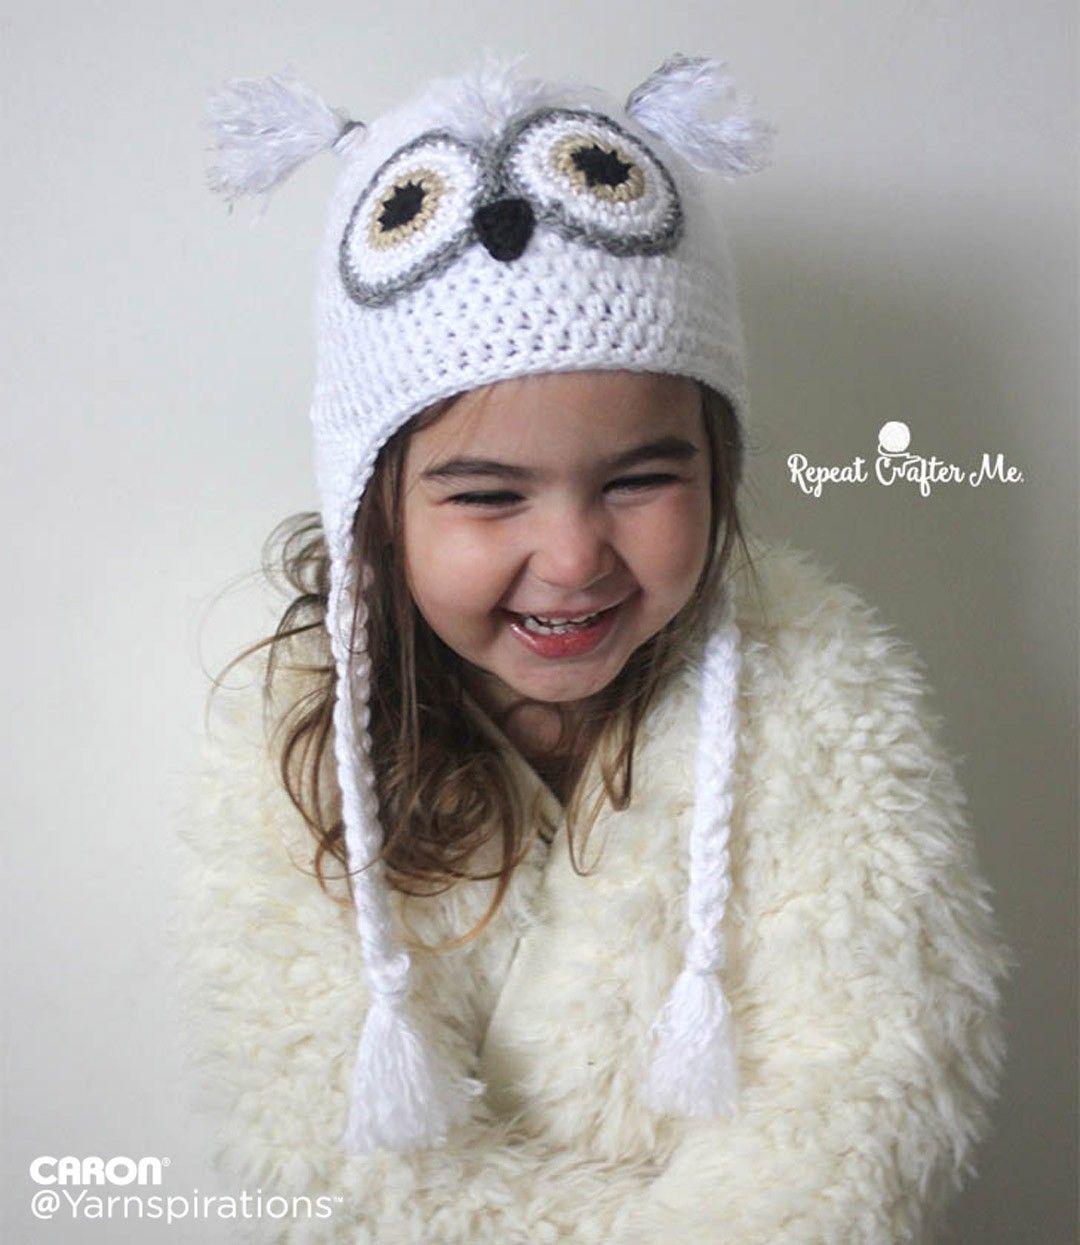 Snowy Owl Crochet Hat - Patterns | Yarnspirations | Crochet Patterns ...